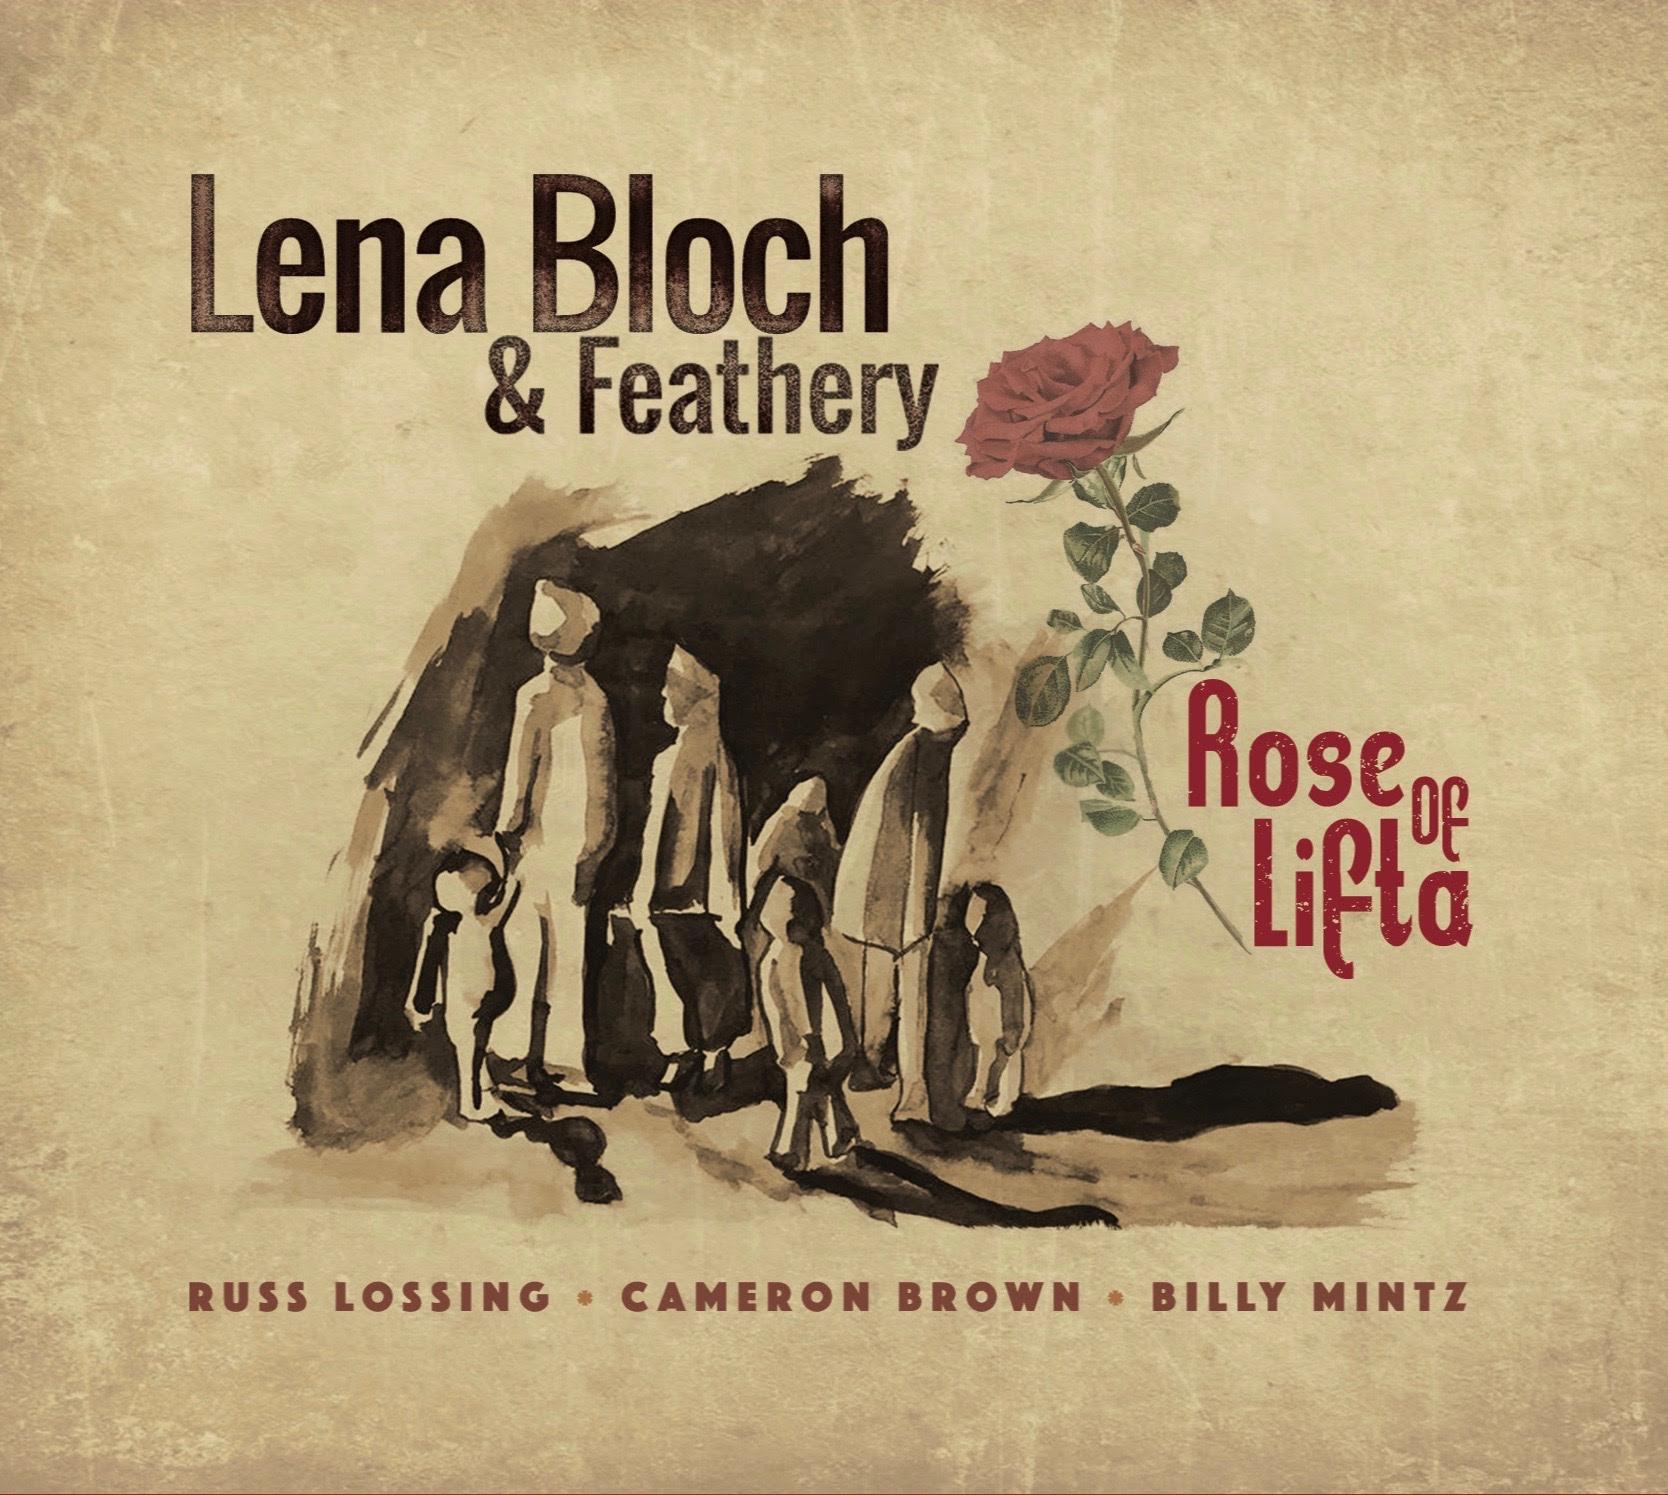 rose of lifta _ cover